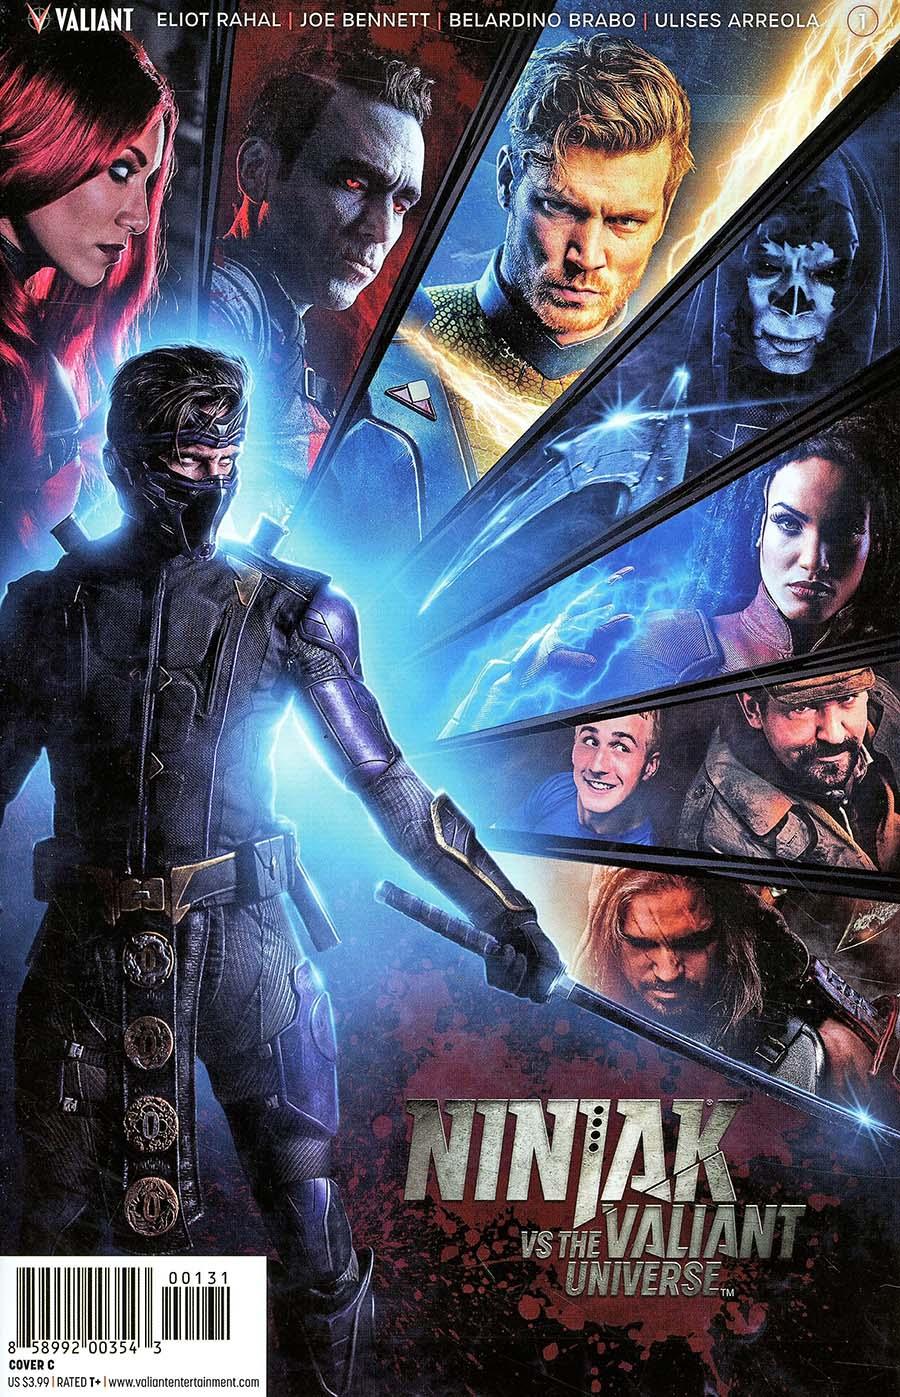 Ninjak vs The Valiant Universe #1 Cover C Variant Photo Cover